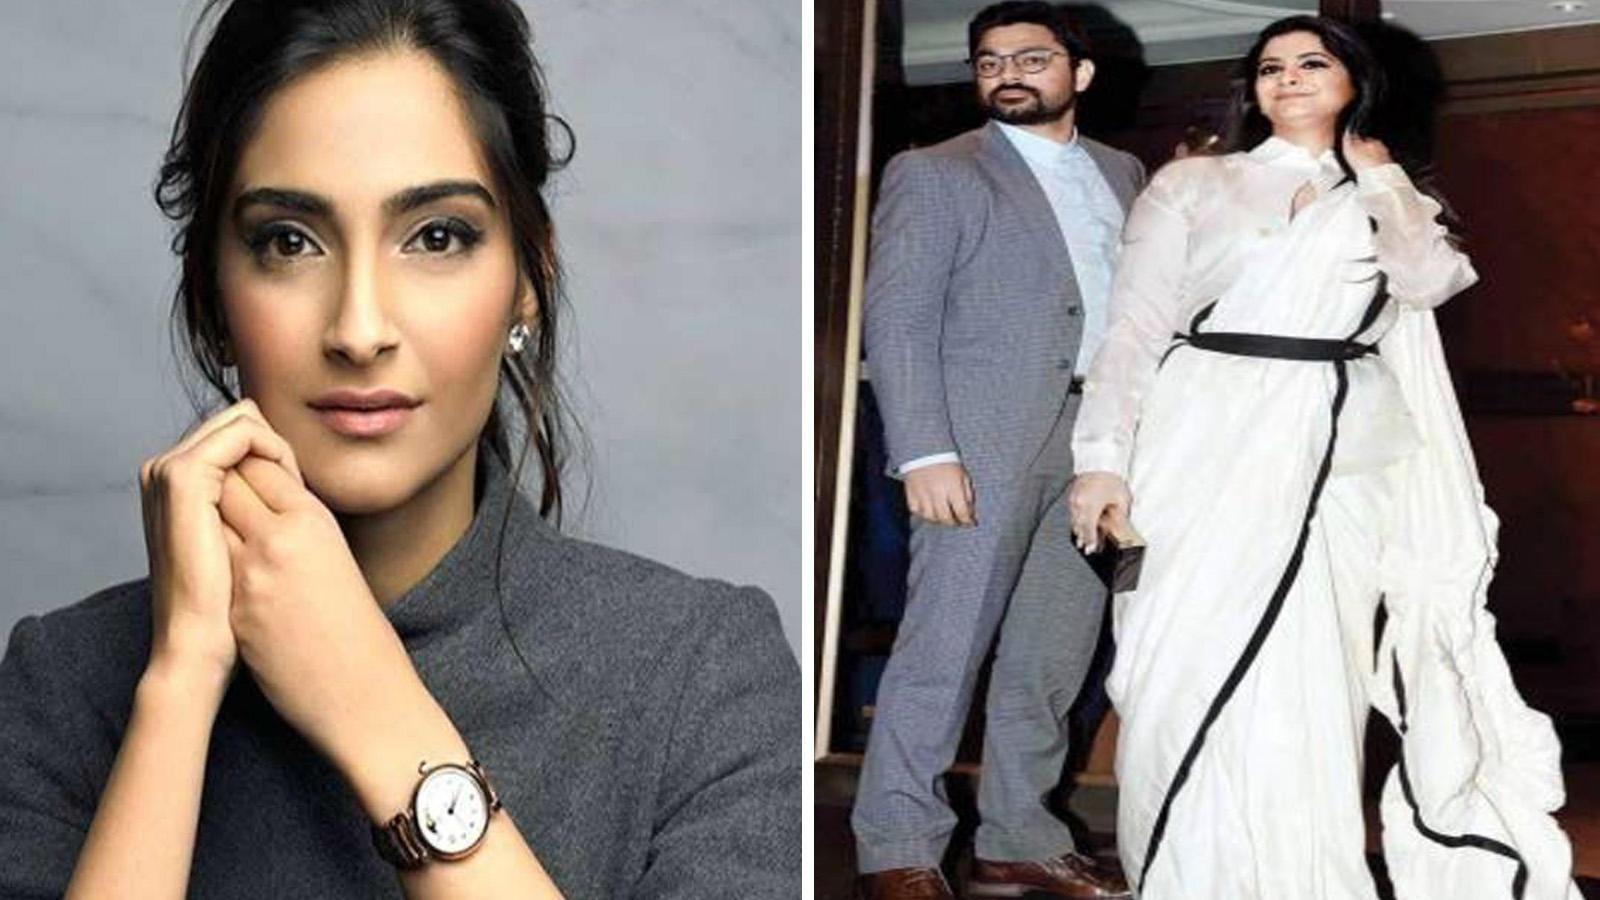 Sonam Kapoor spills the beans about sister Rhea and Karan Balooni's relationship status